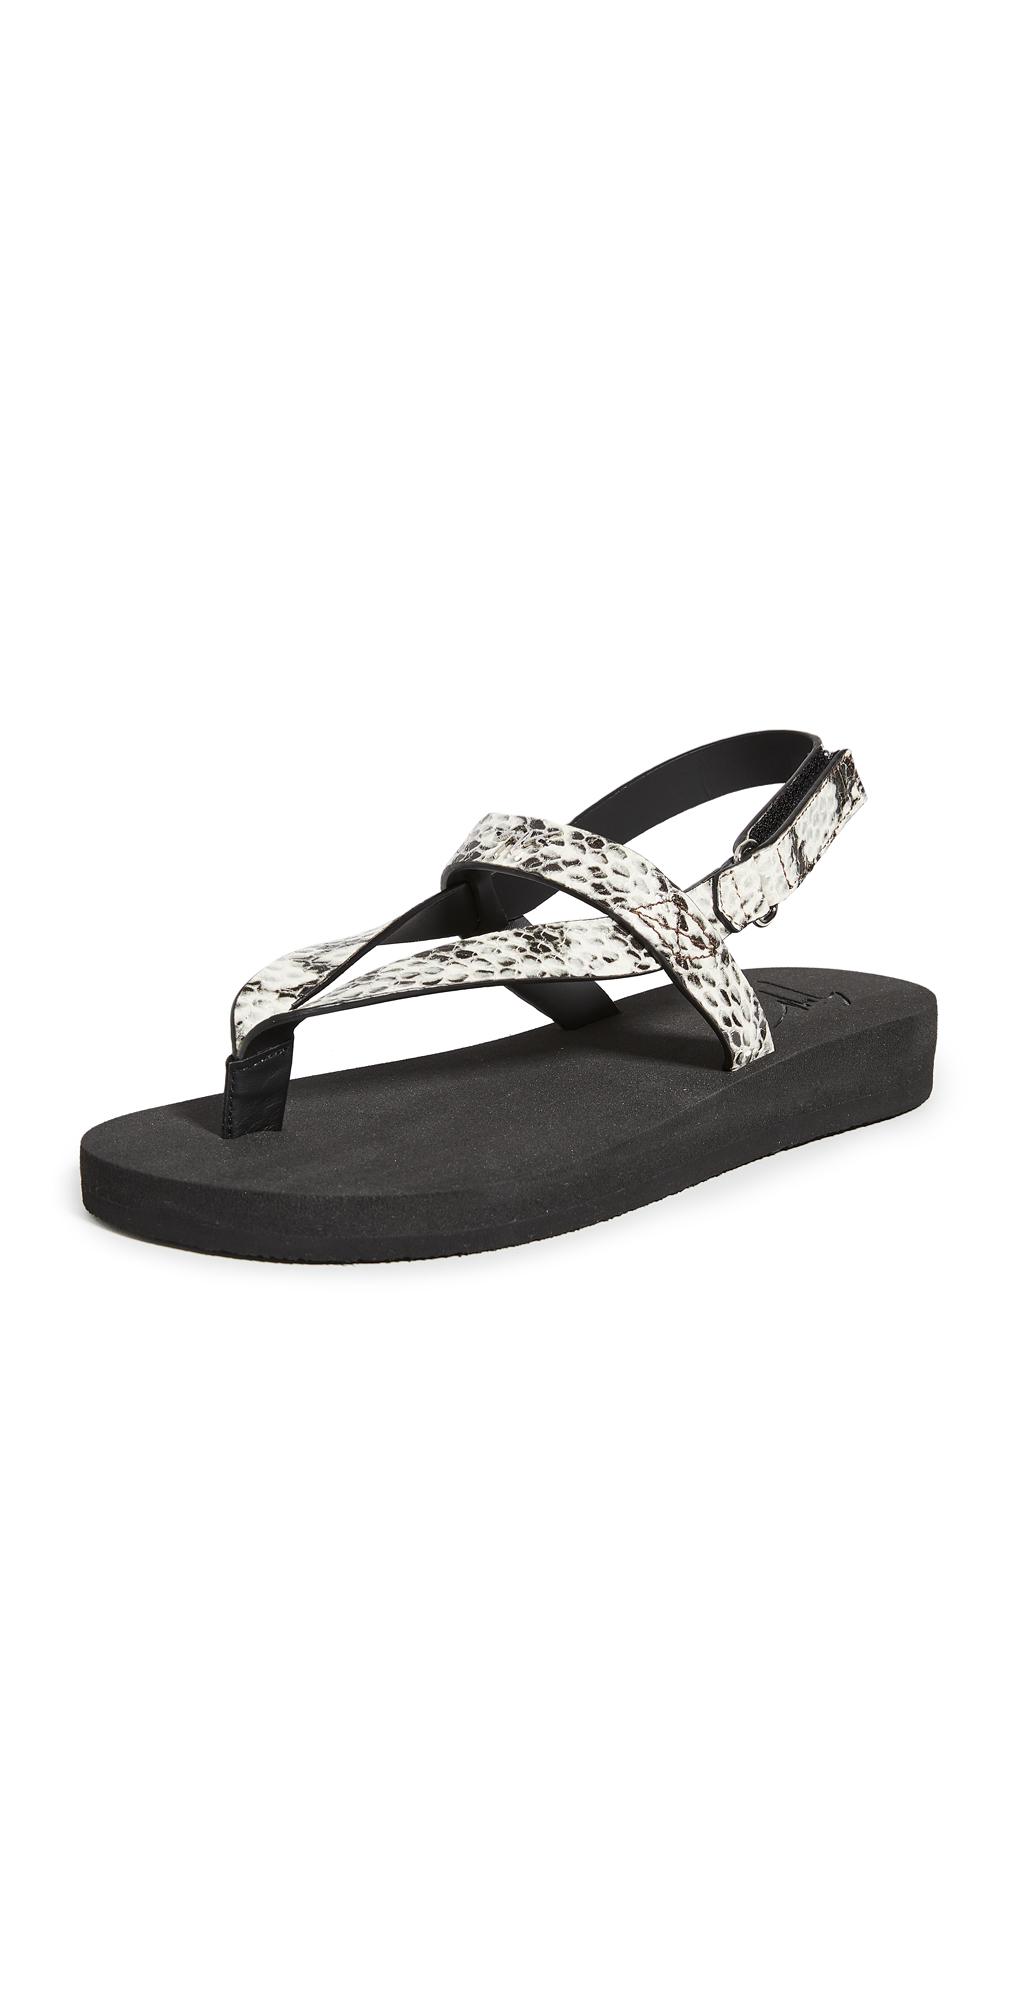 Giuseppe Zanotti Tasmania Sandals